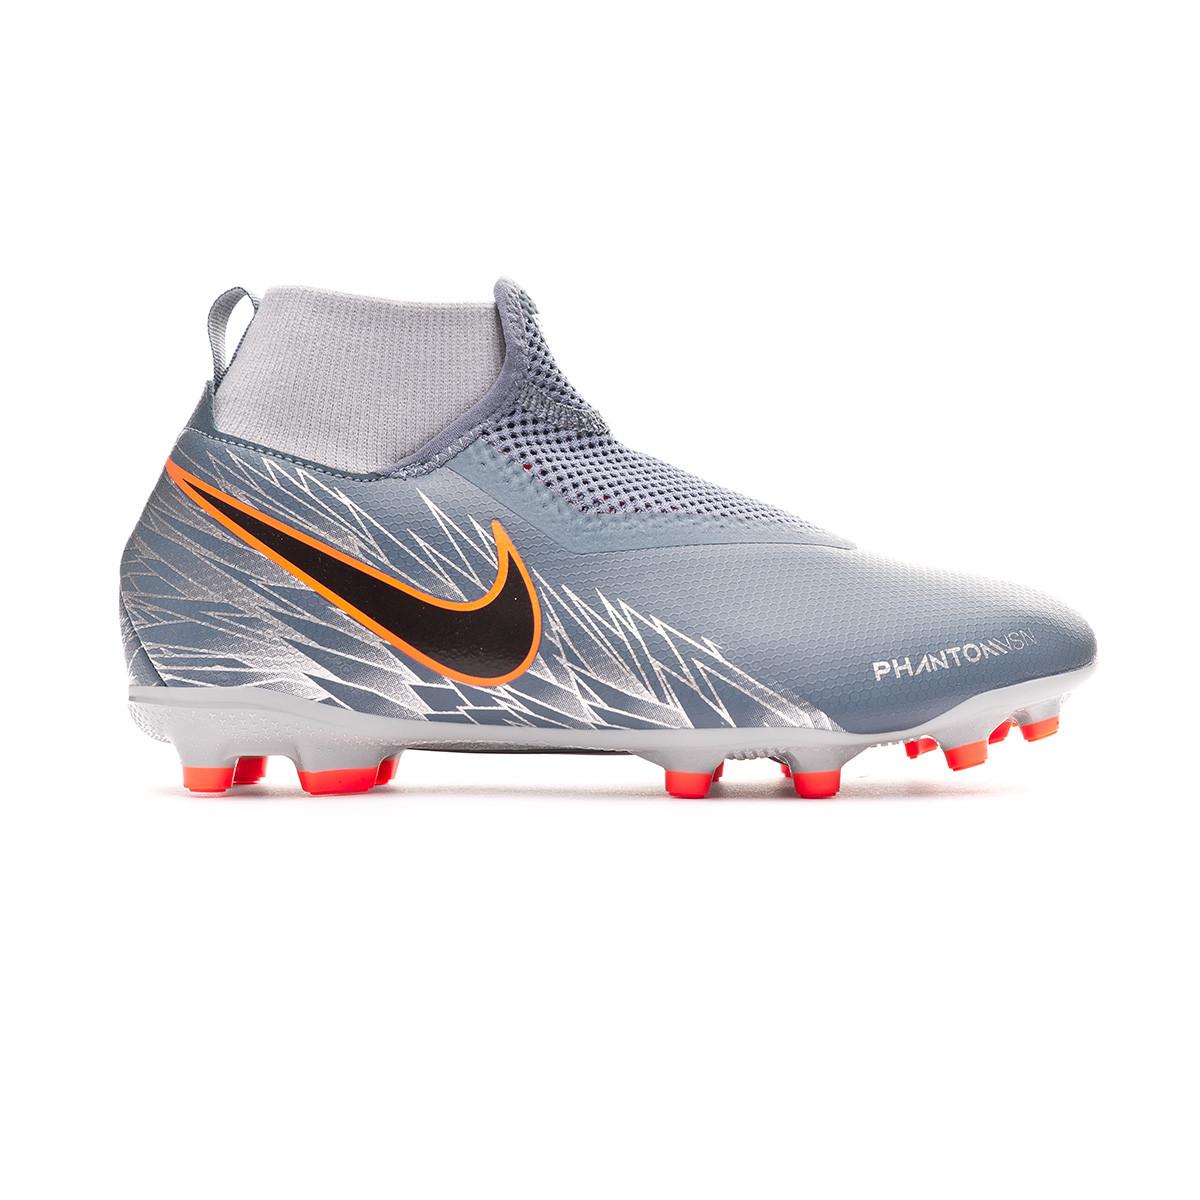 Muscular Decir Permiso  Football Boots Nike Kids Phantom Vision Academy DF FG/MG Armory  blue-Black-Hyper crimson - Football store Fútbol Emotion